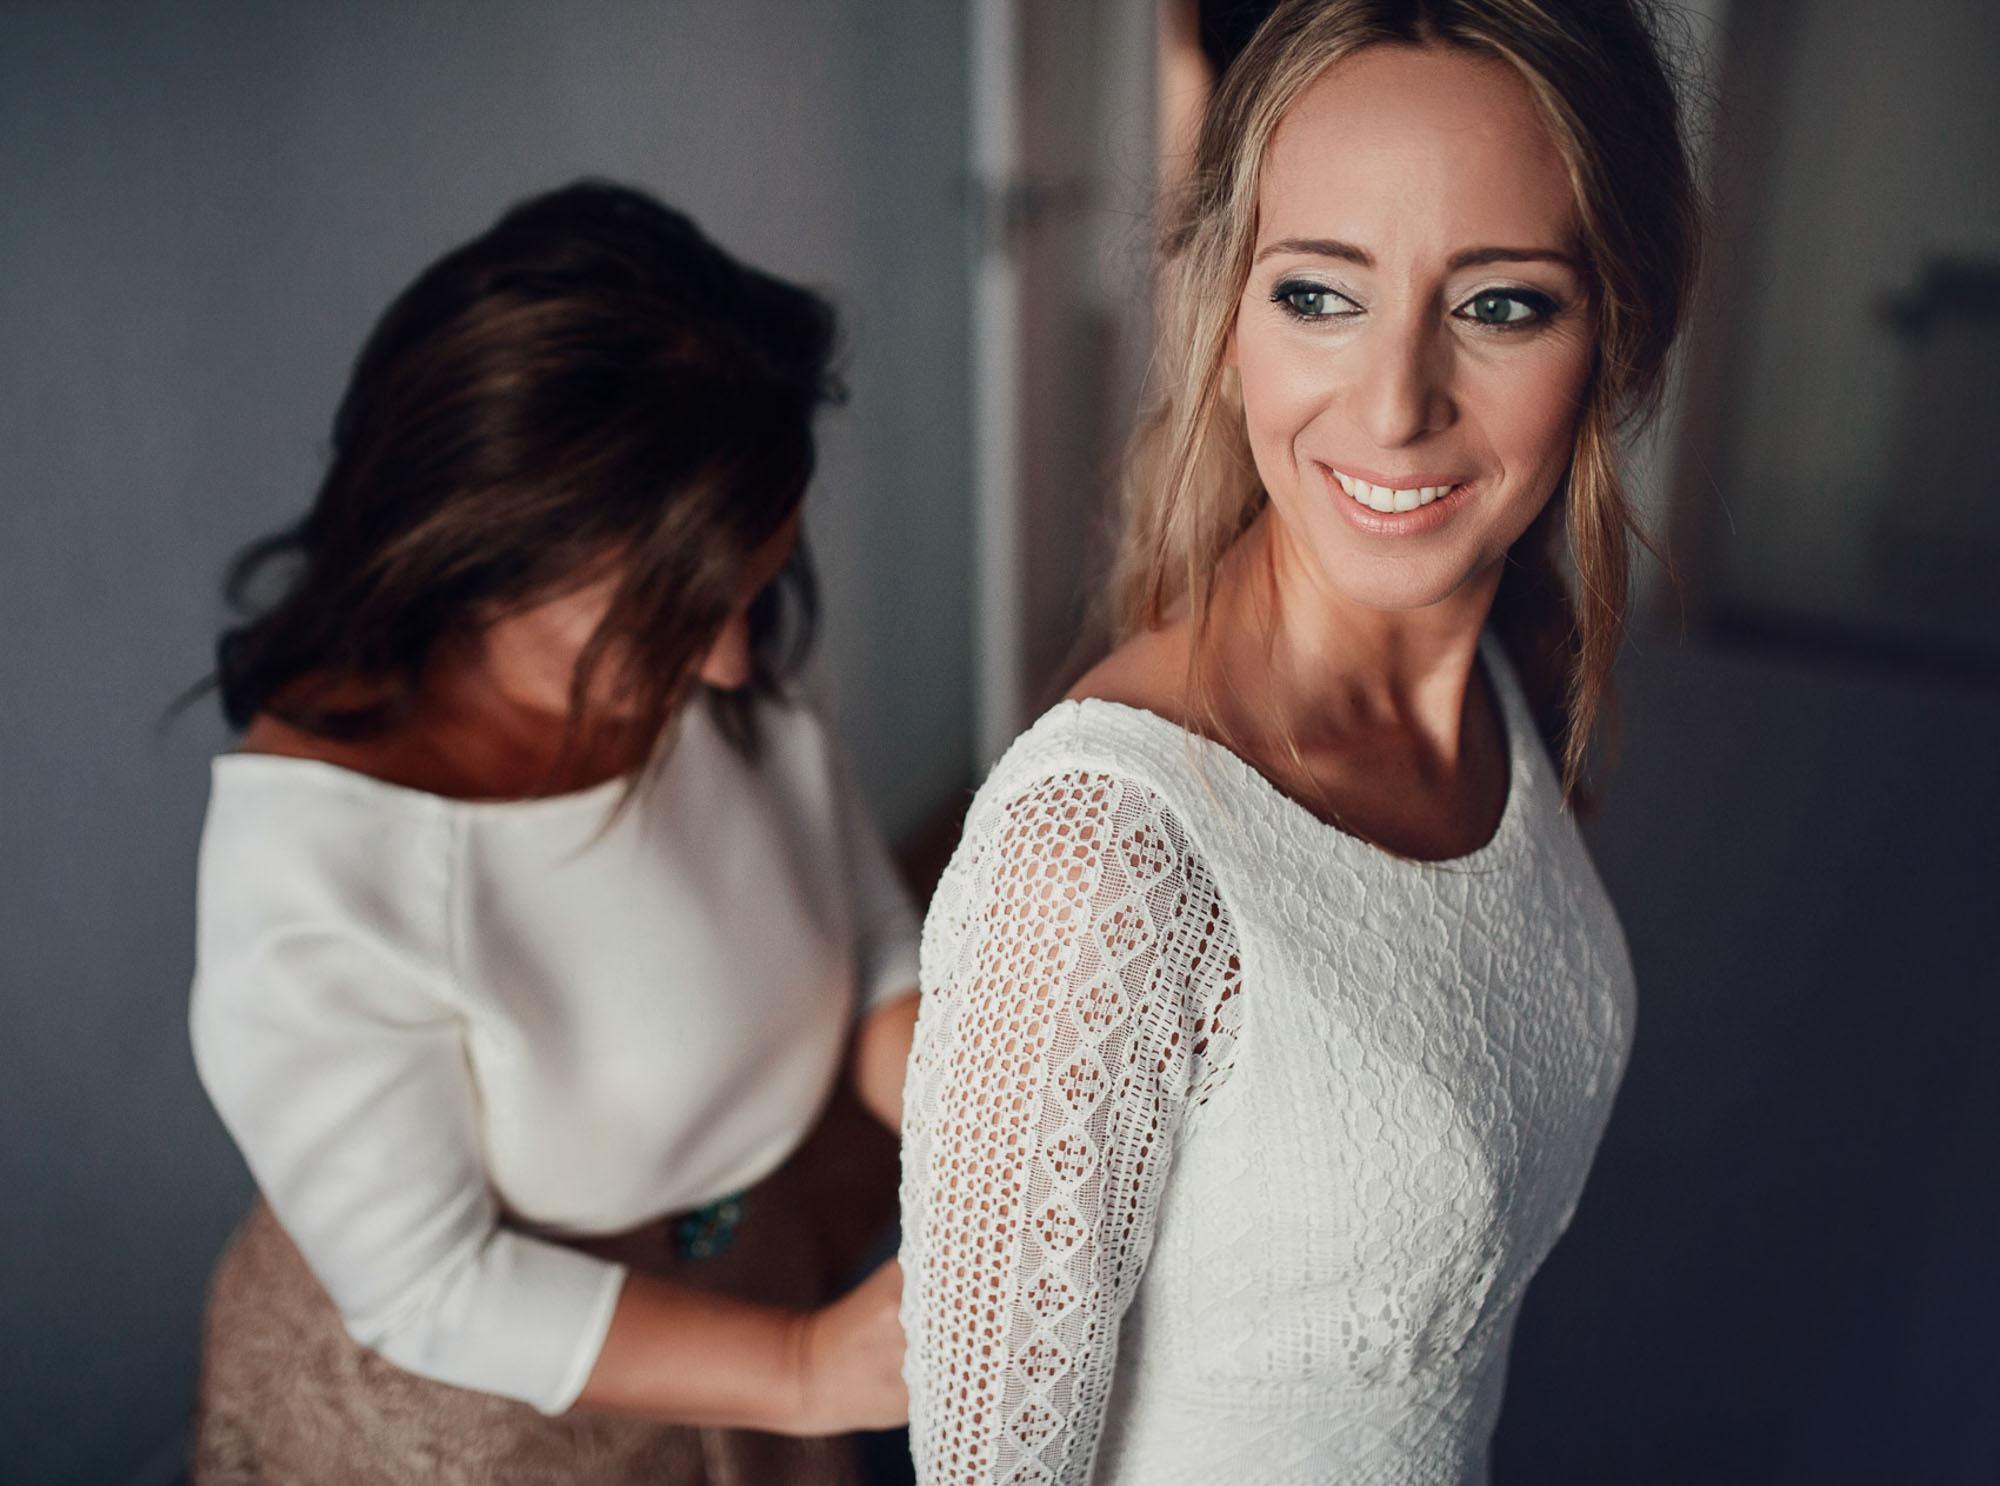 detalle maquillaje makeup peluqueria novia wedding madrina